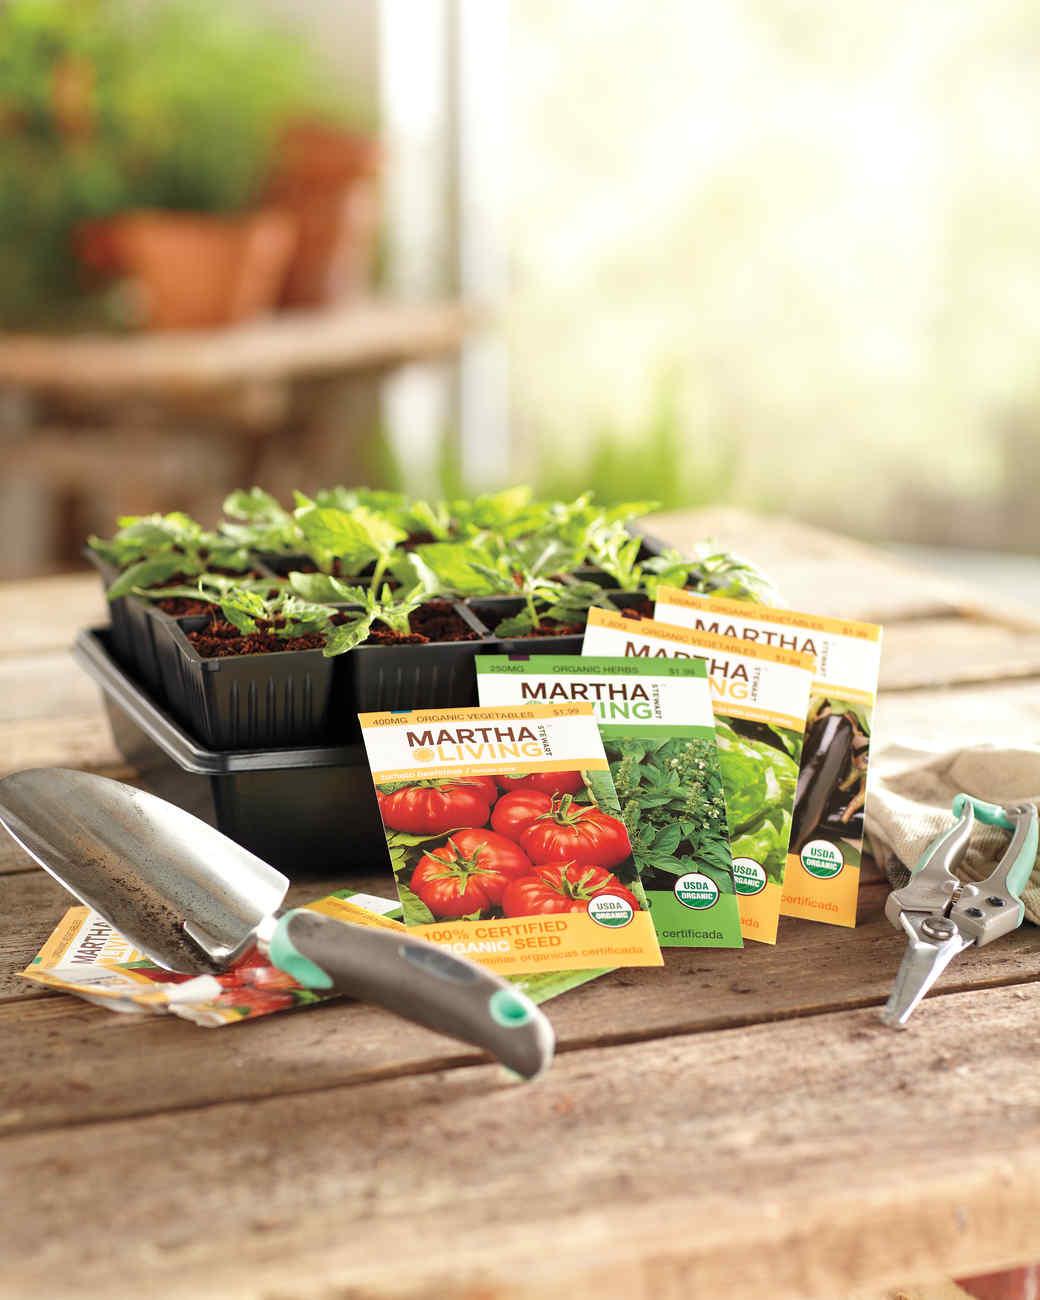 Attractive Vegetable Garden Gift Ideas Part - 13: Great Start